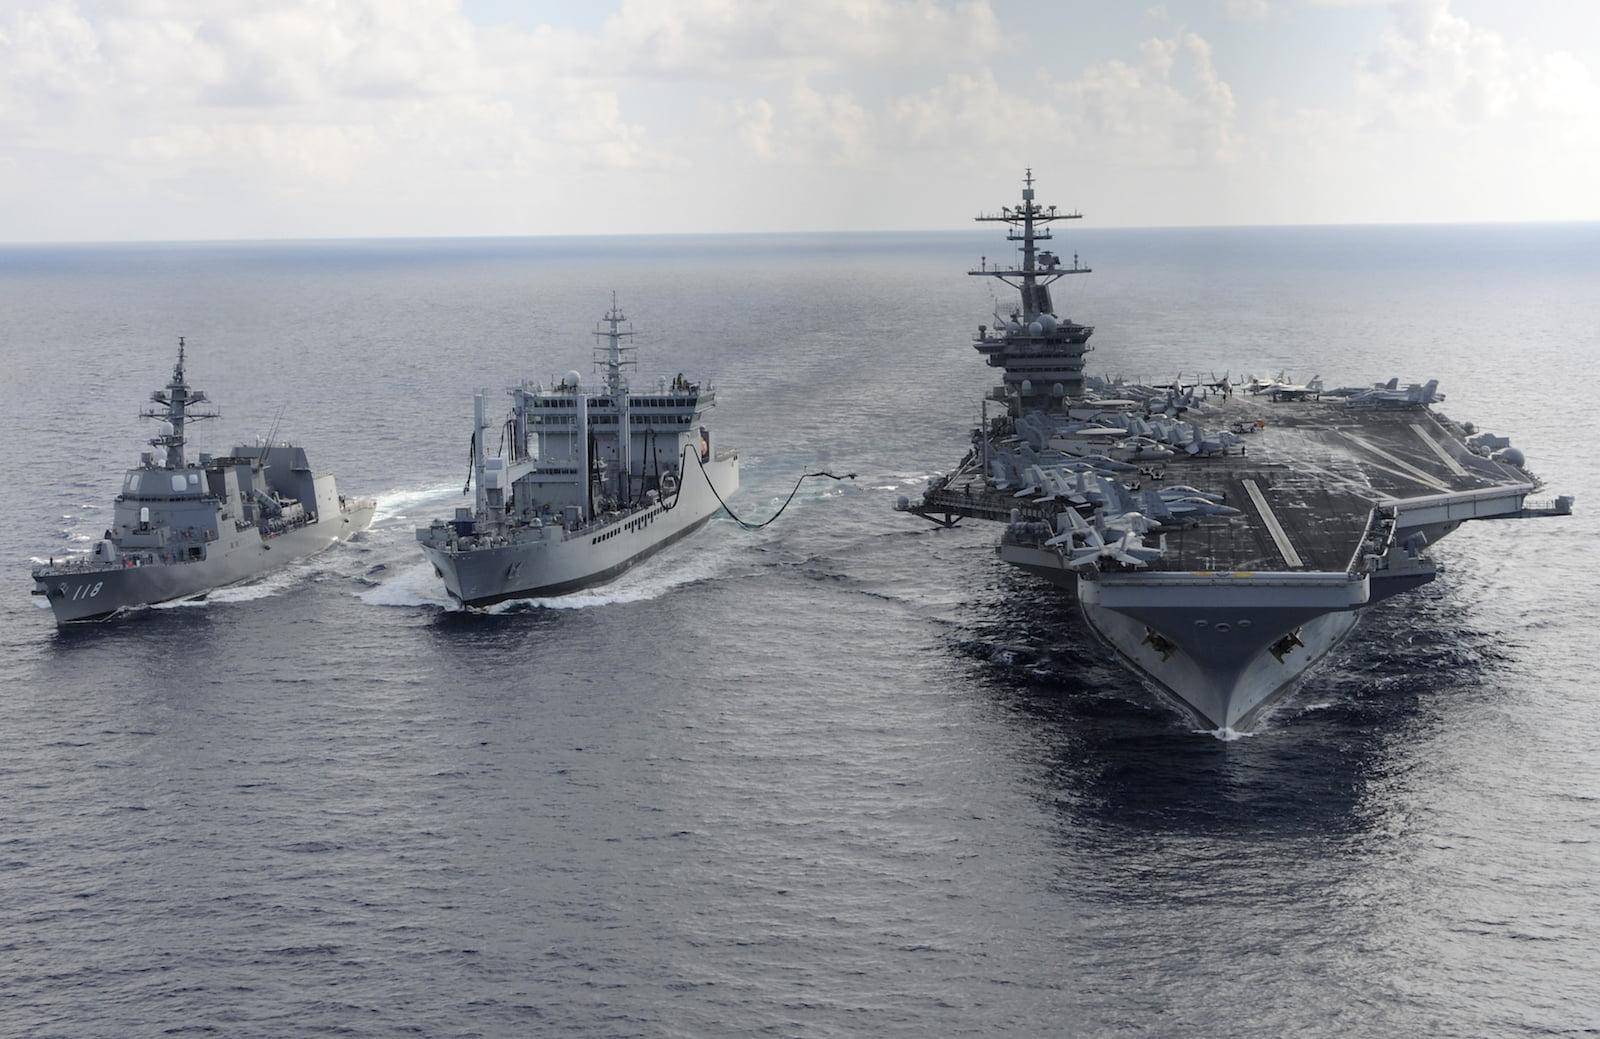 US aircraft carrier USS Theodore Roosevelt (R), Japanese Maritime Self-Defense Force Akizuki-class destroyer JS Fuyuzuki (L) and India's Deepak-class fleet tanker INS Shakti (C) during Exercise Malabar 2015. Photo: AFP/Handout/US Navy/ Chad M. Trudeau